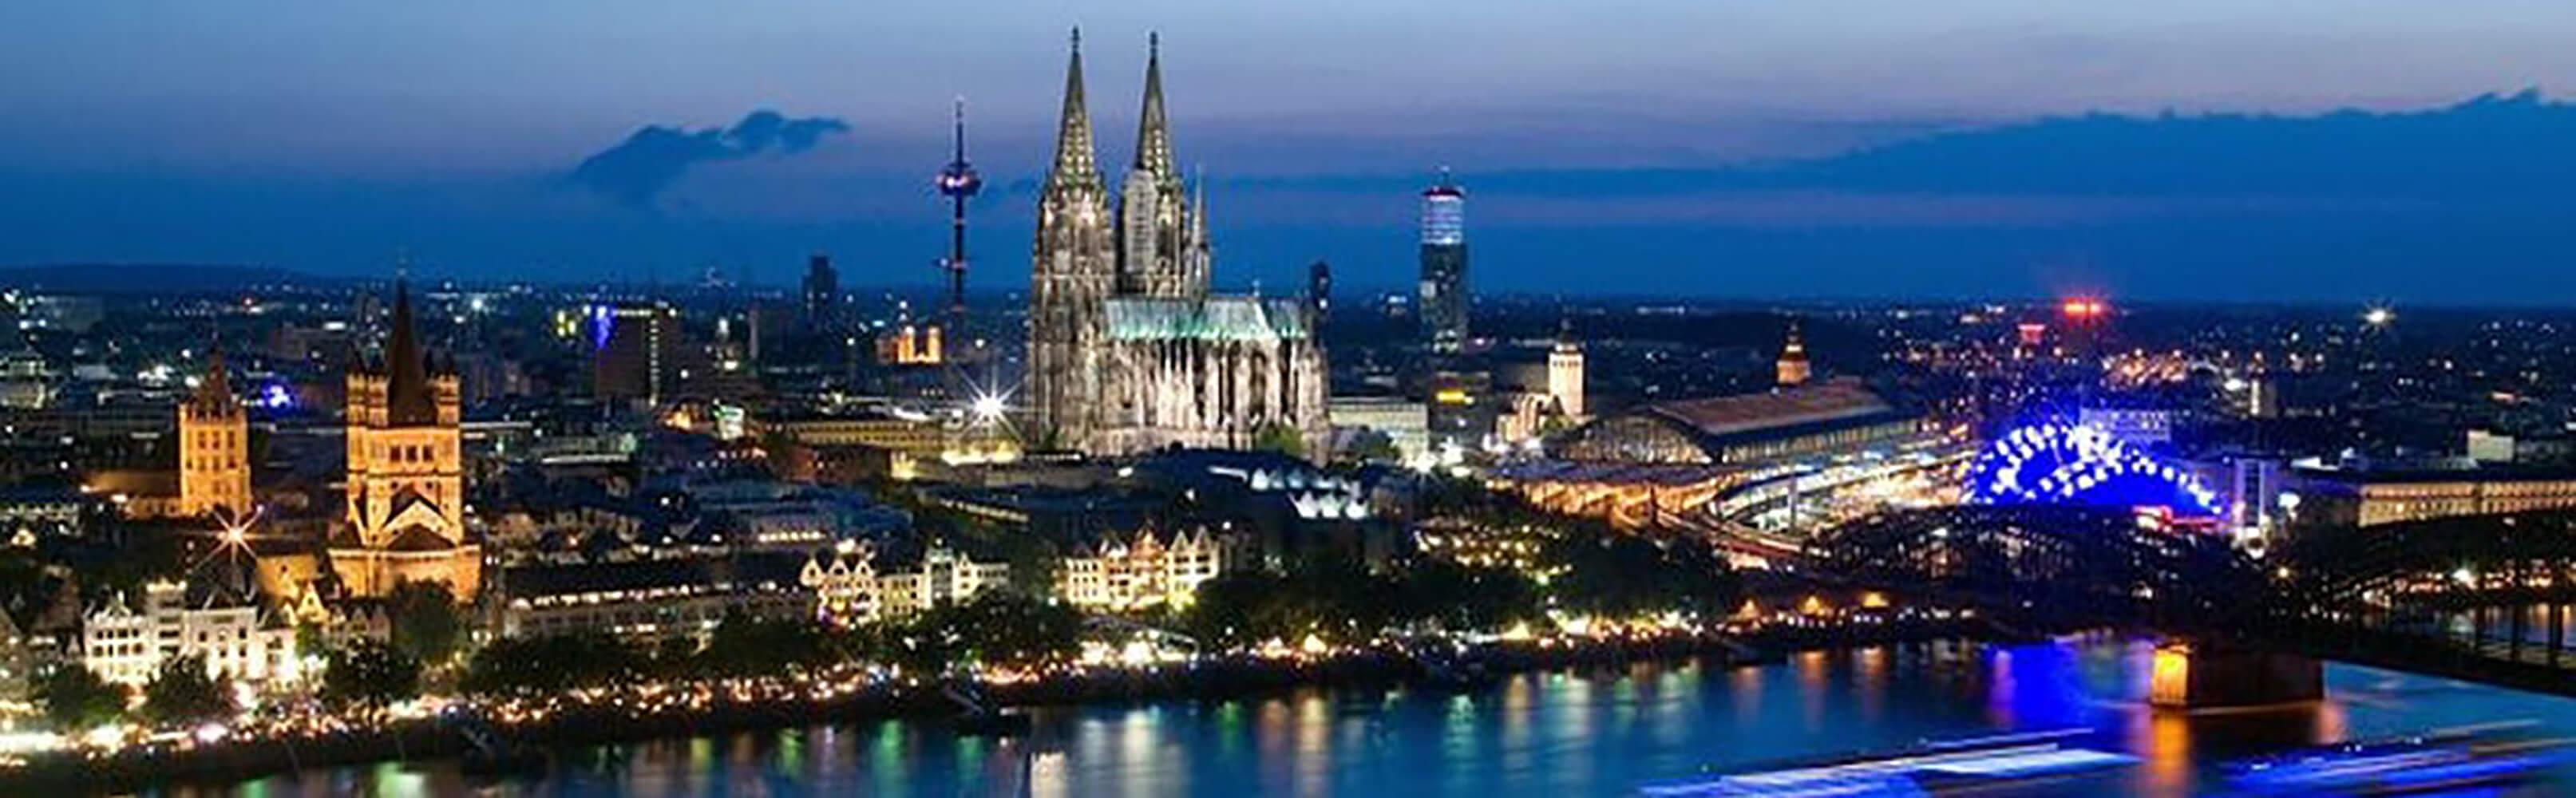 Köln - Metropole am Rhein 1